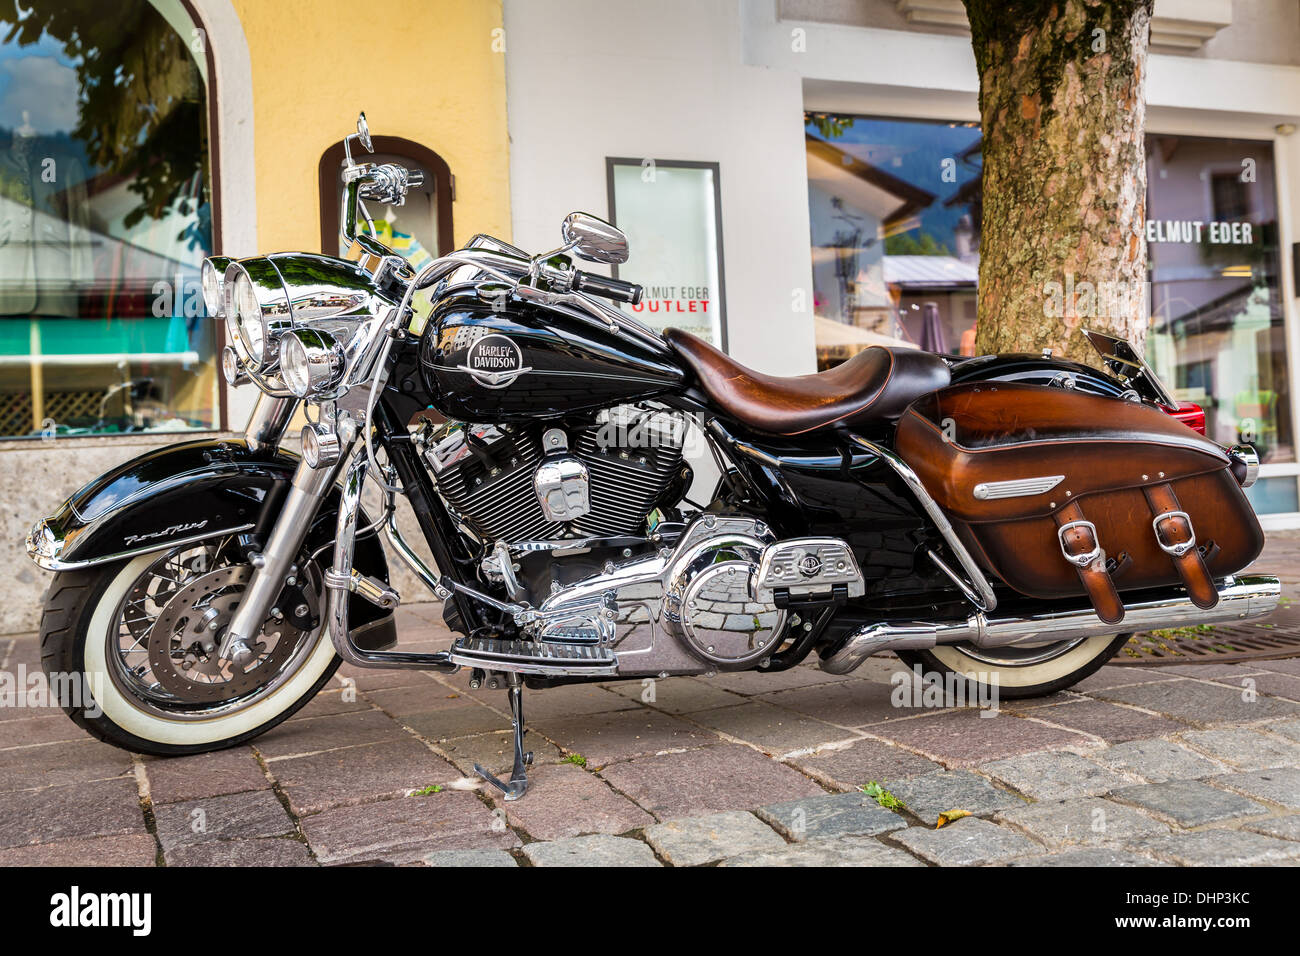 Harley Davidson Motorrad, Kitzbühel, Tyrol, Austria - Stock Image